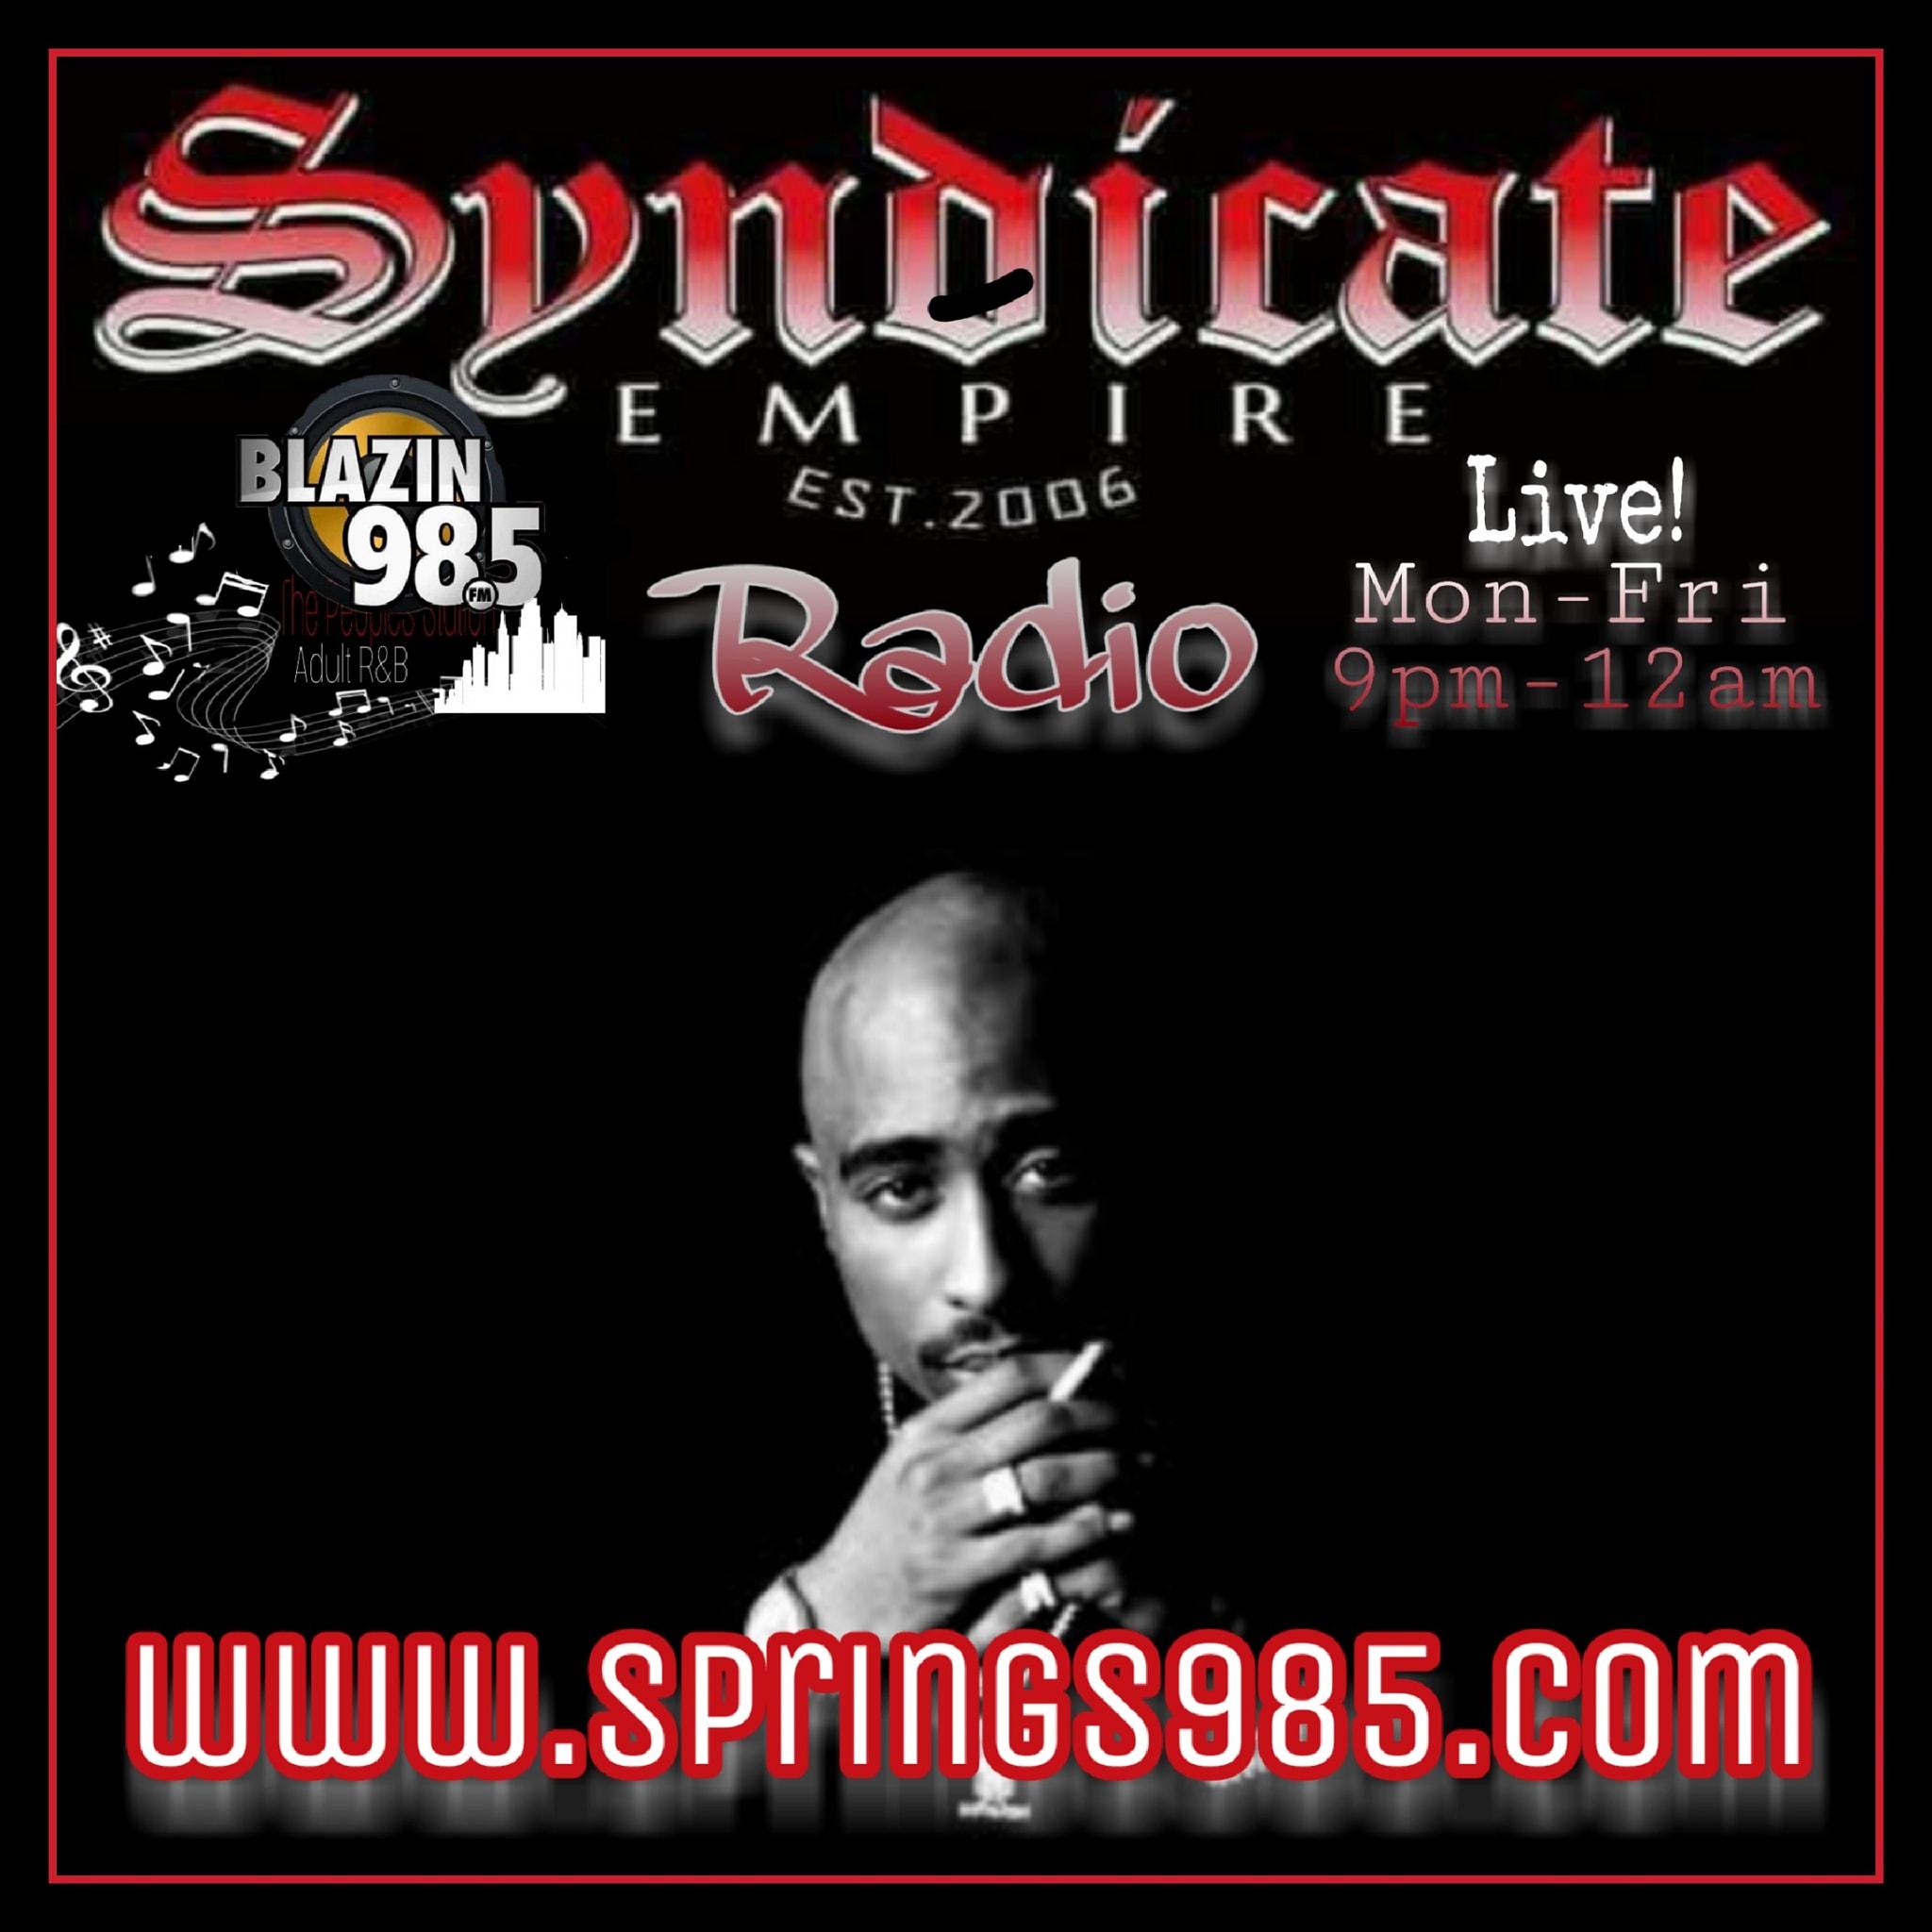 $yndicate Empire Radio